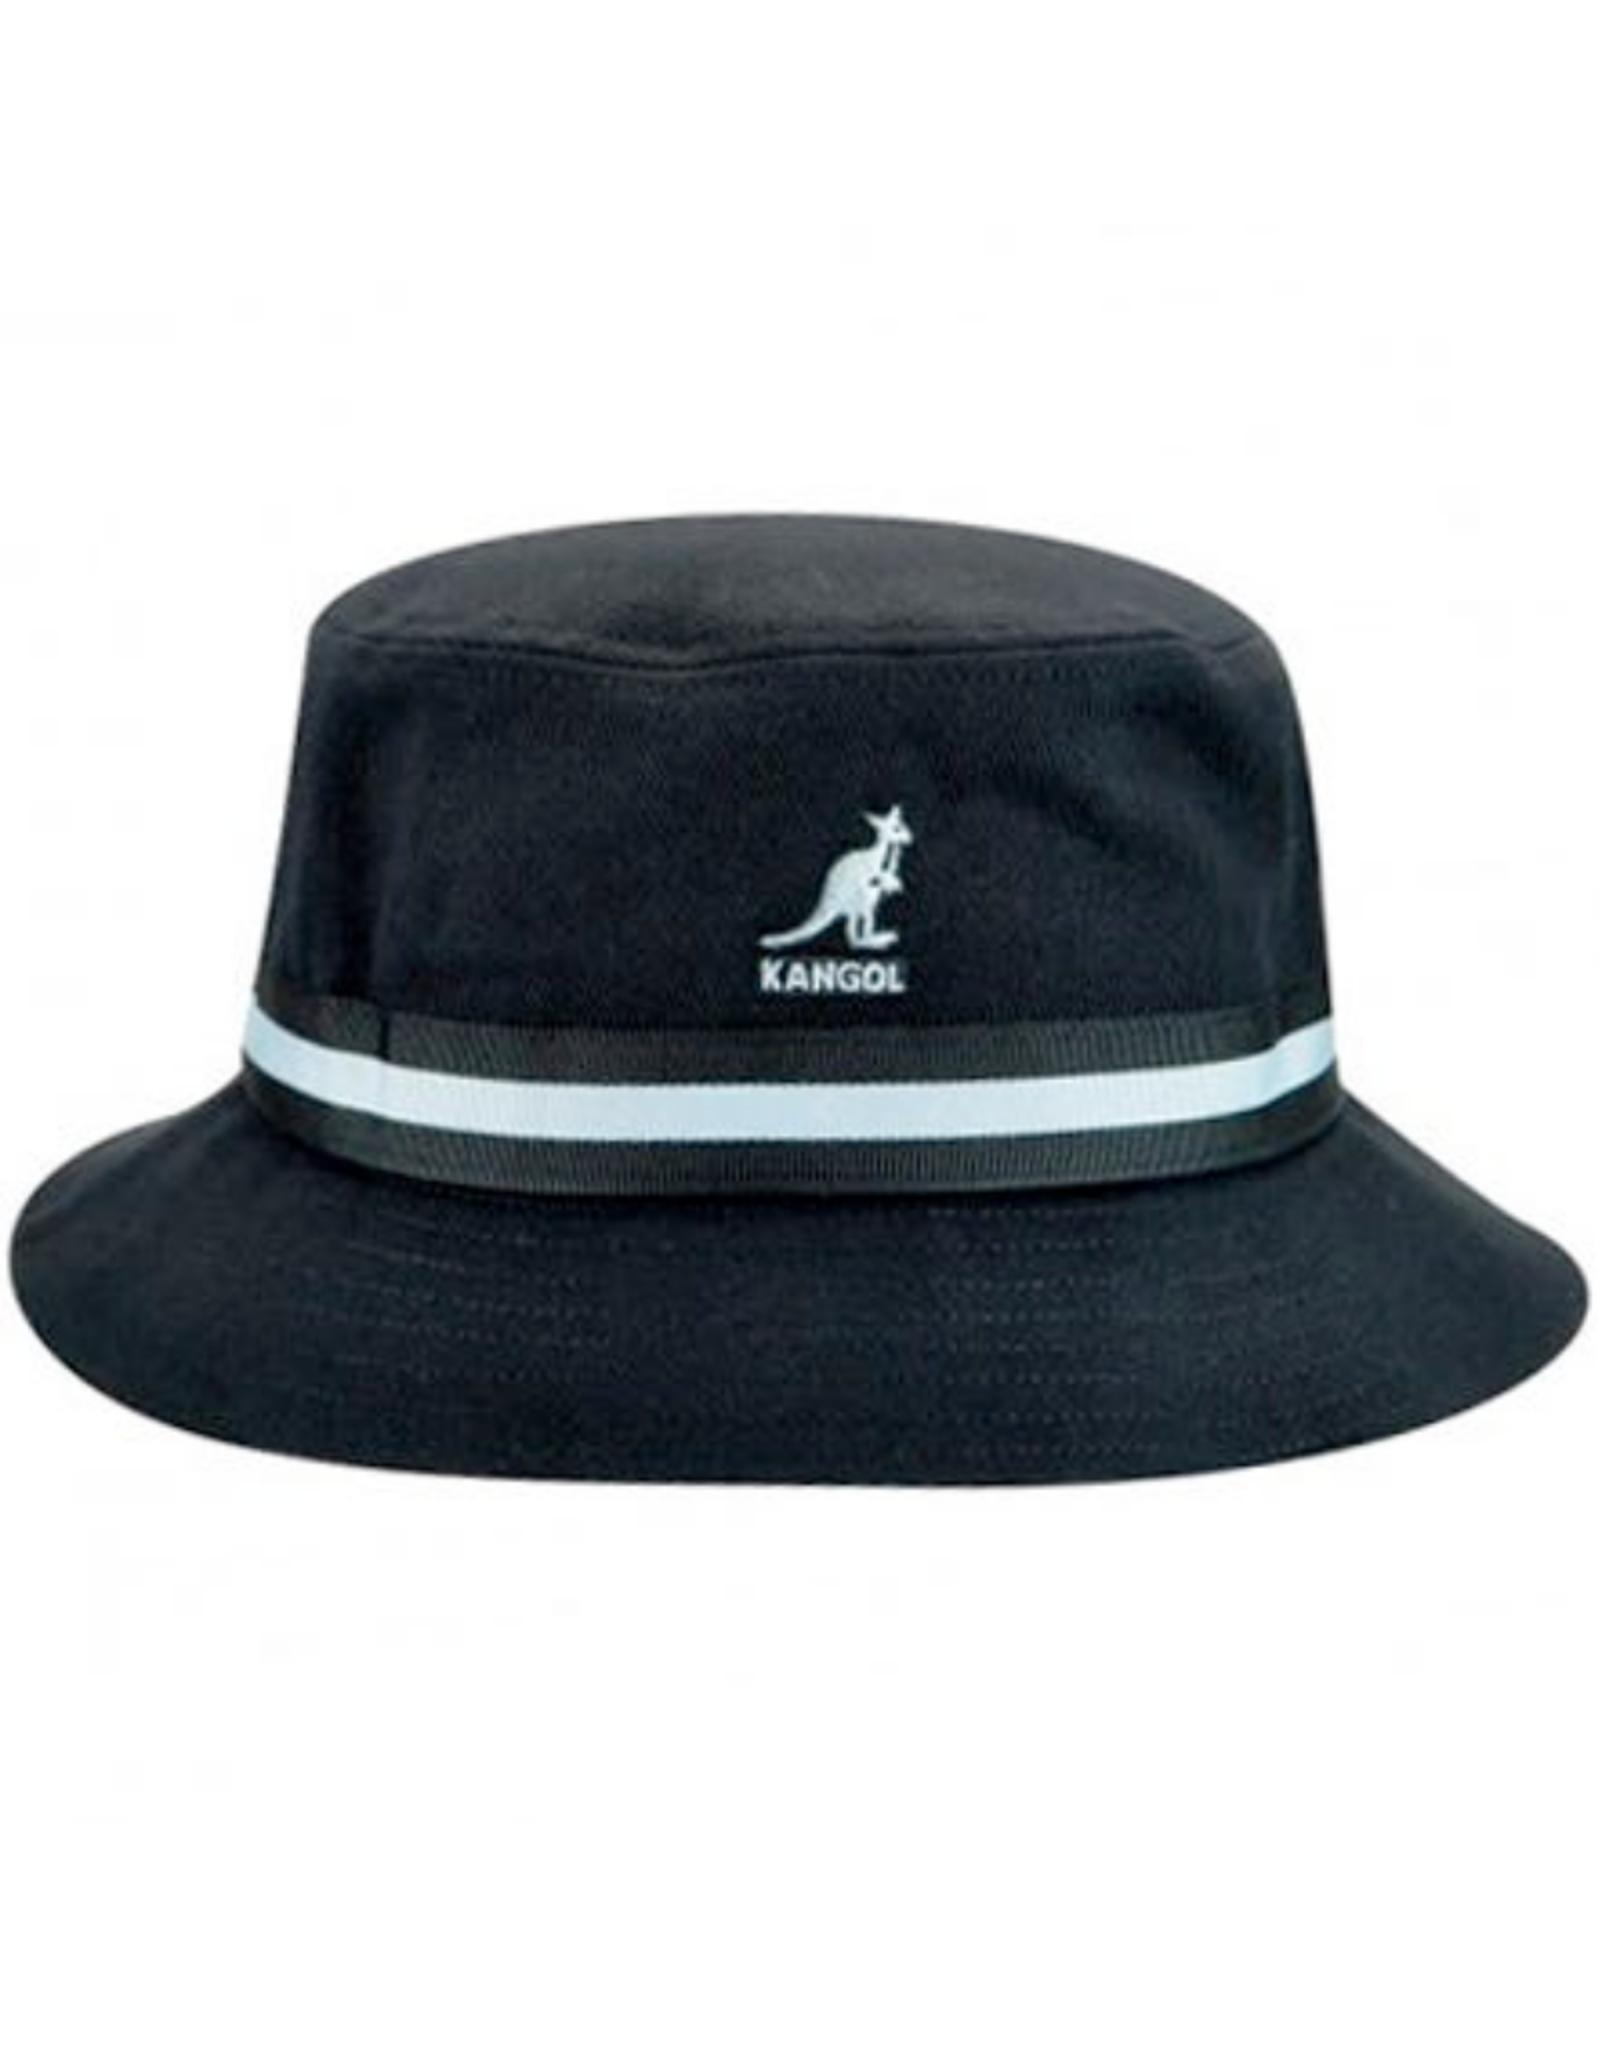 "Kangol HAT-BUCKET ""STRIPE LAHINCH"" COTTON"